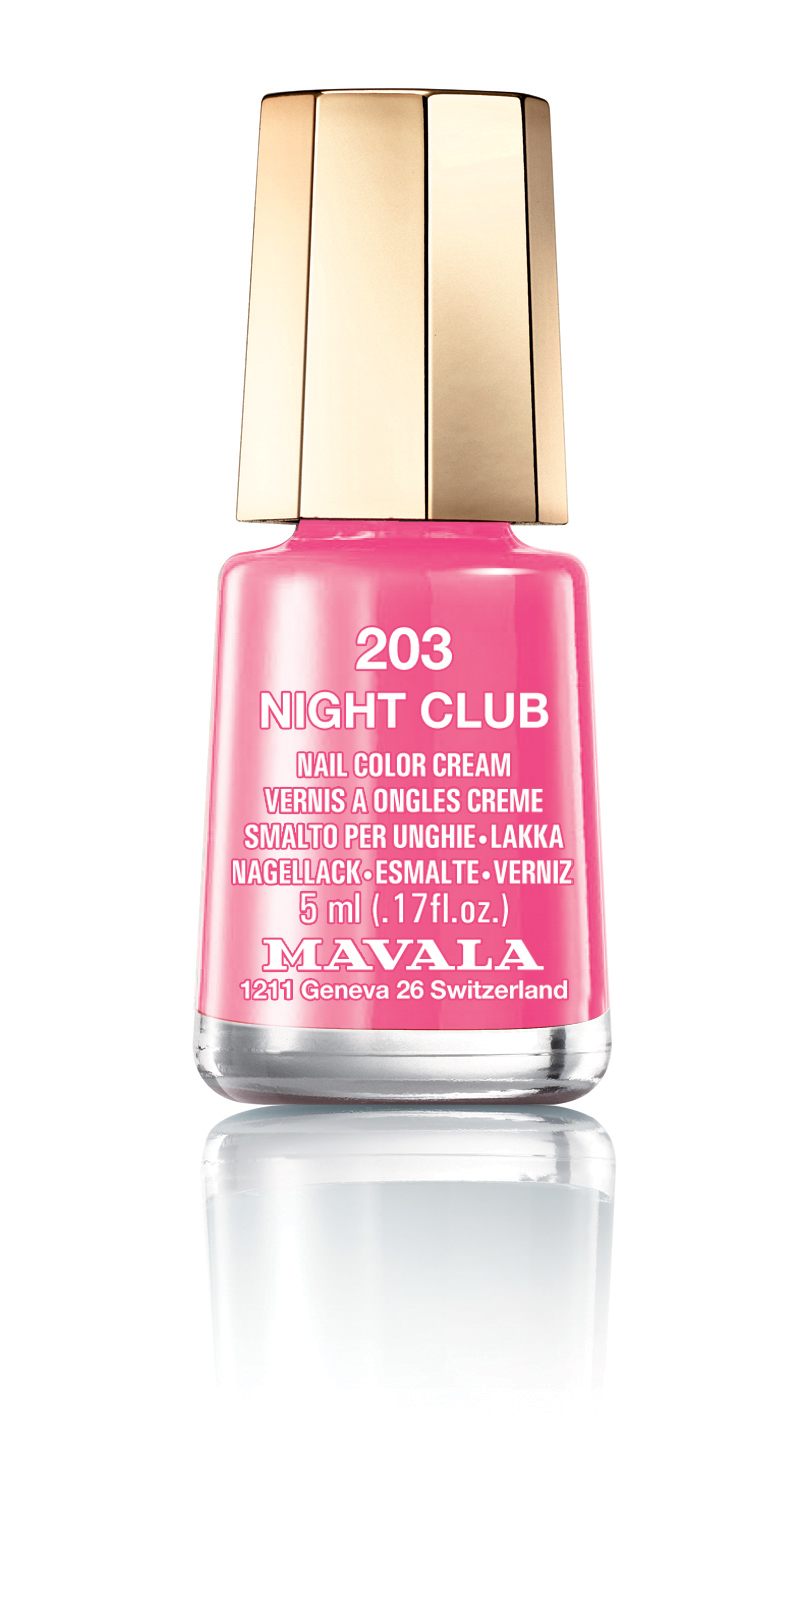 203 NIGHT CLUB